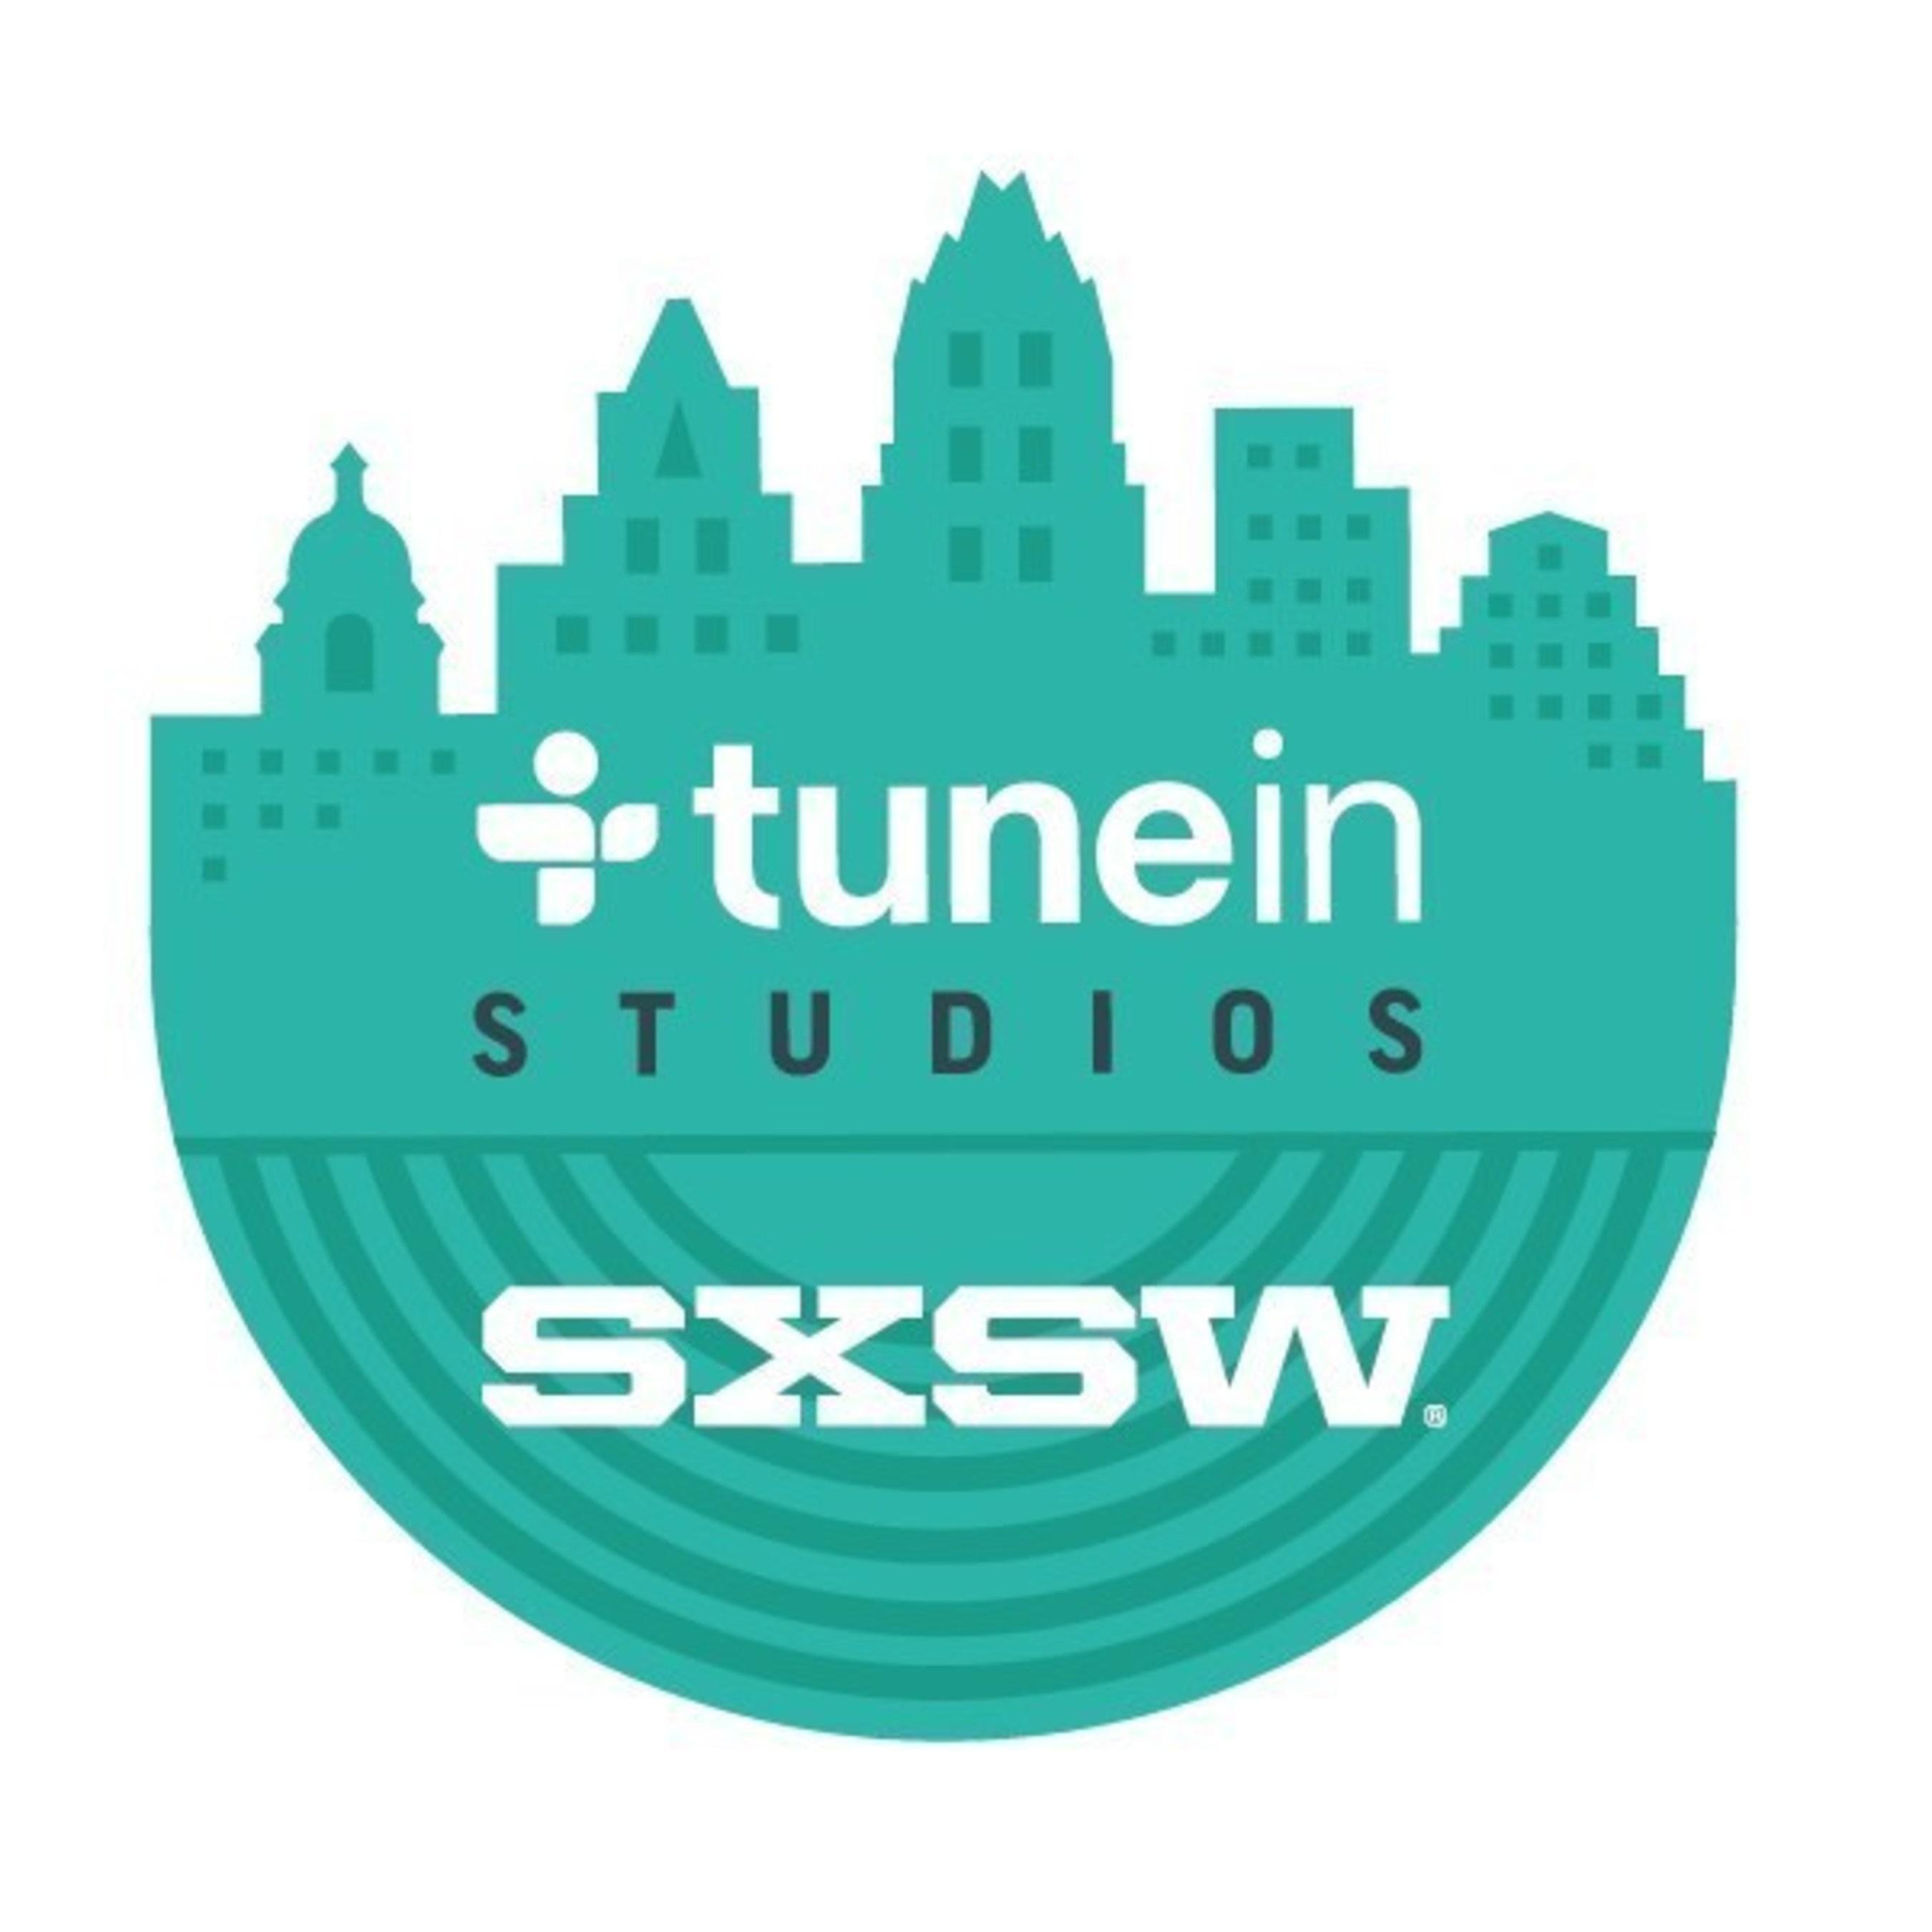 TuneIn at SXSW 2016